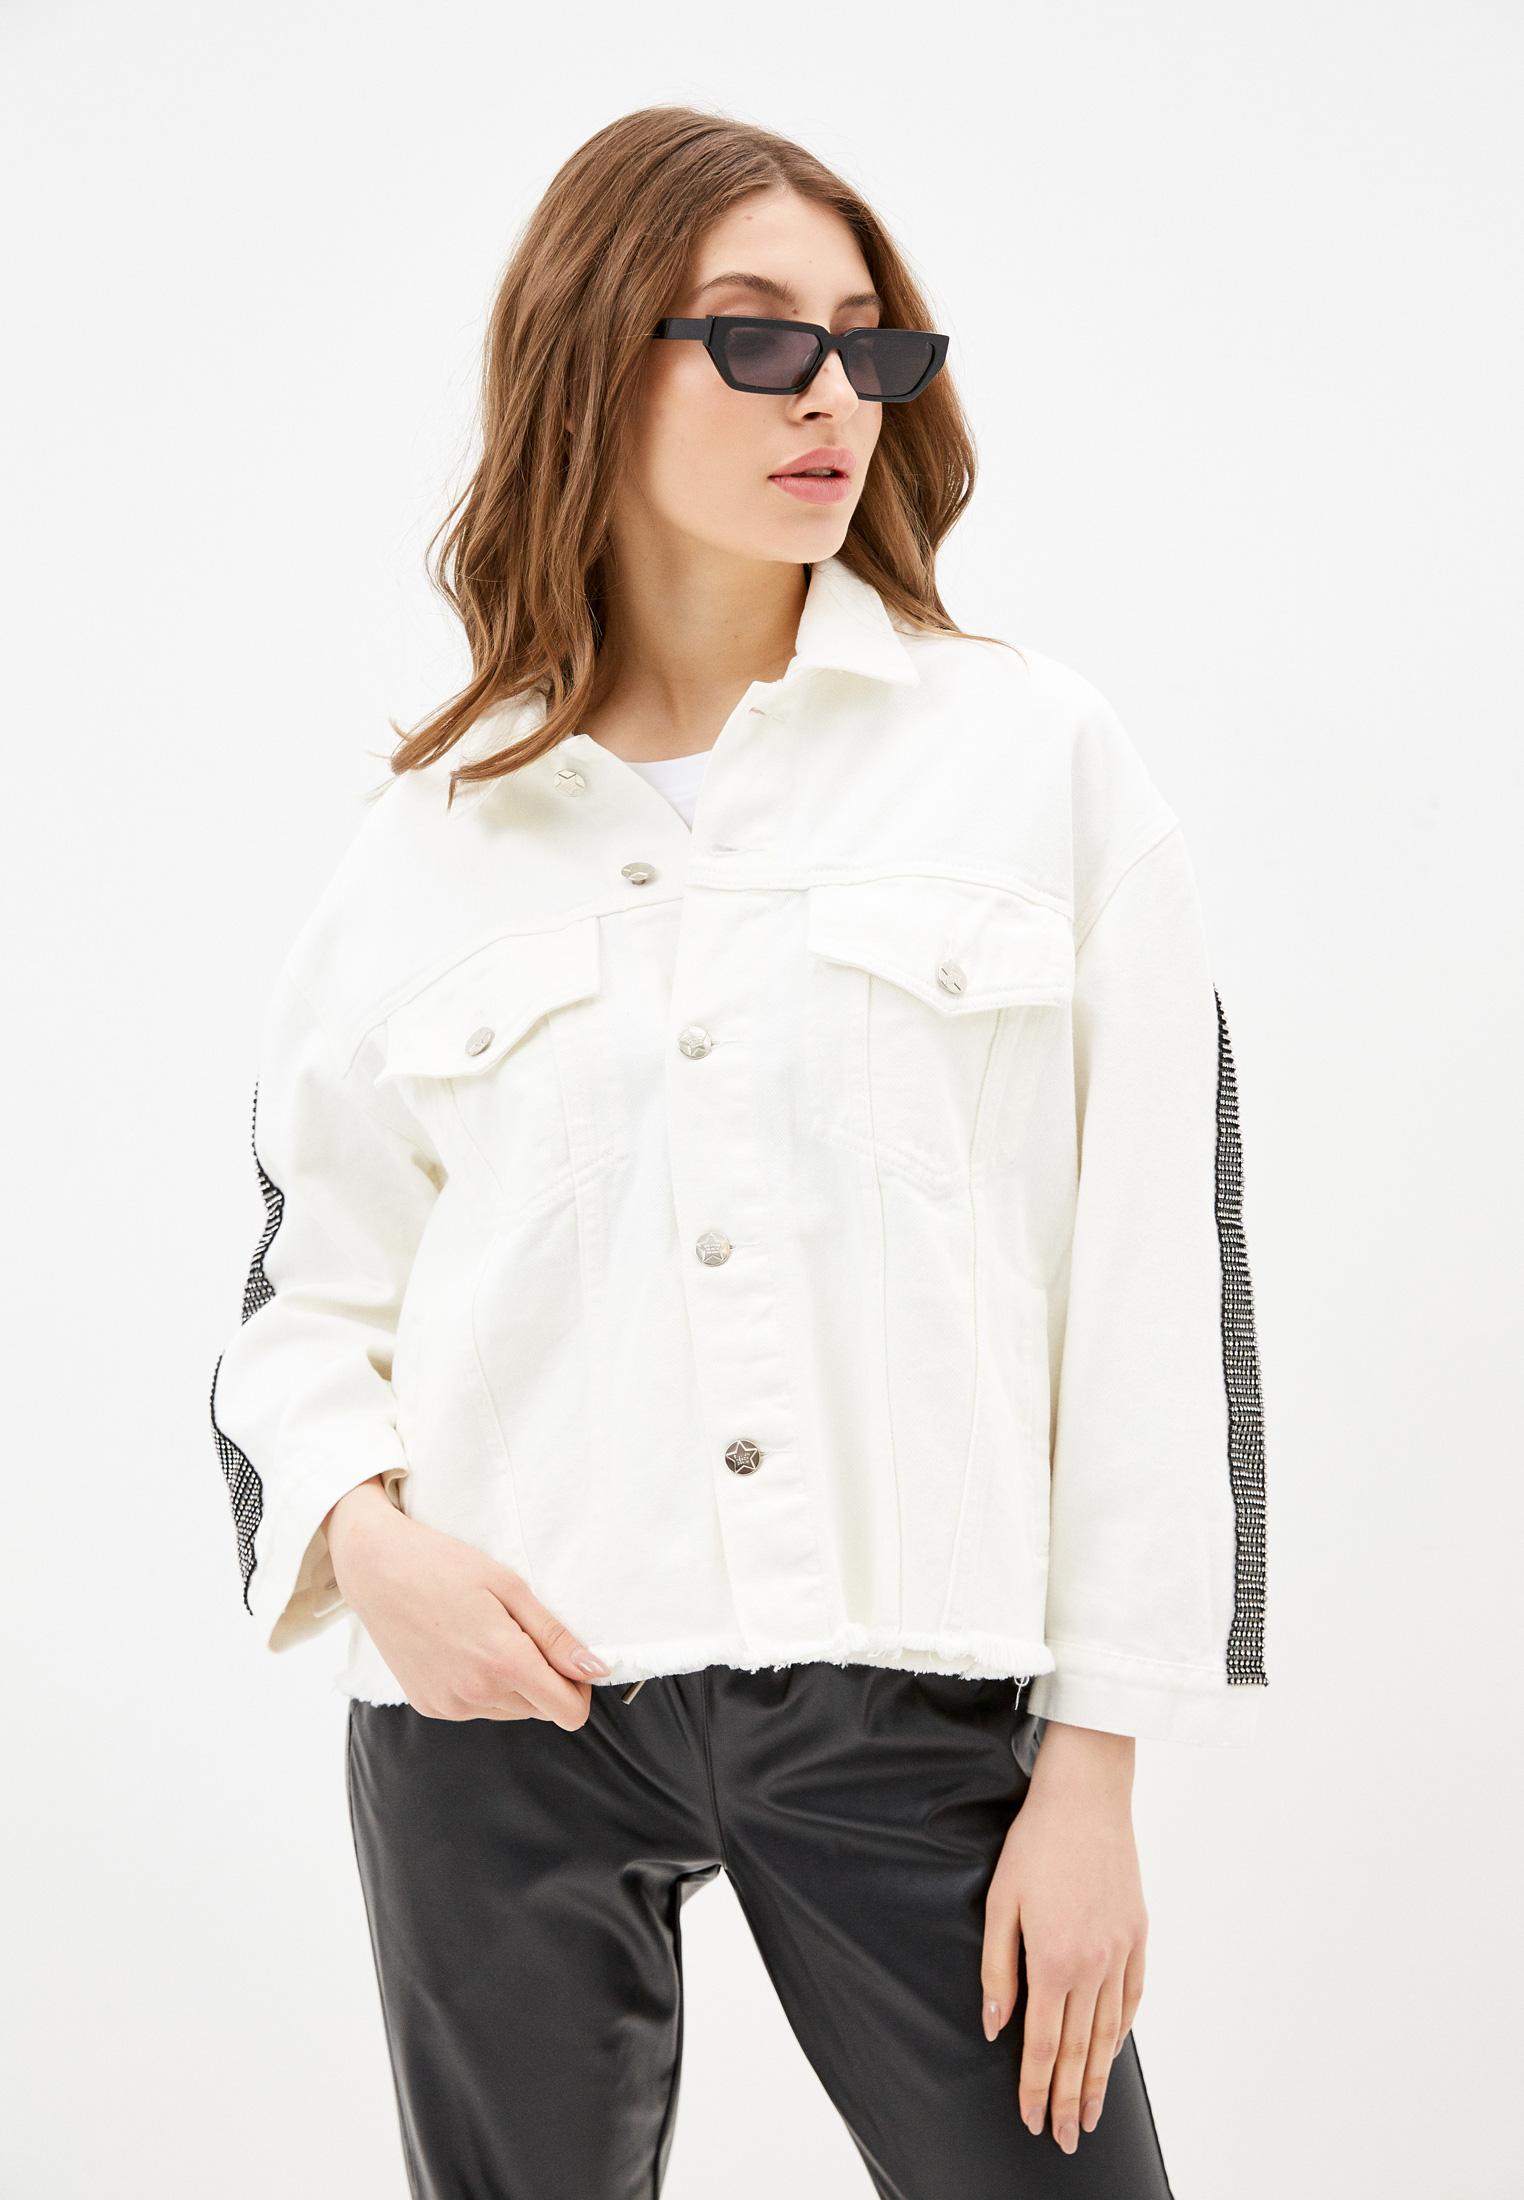 Джинсовая куртка Silvian Heach Куртка джинсовая Silvian Heach